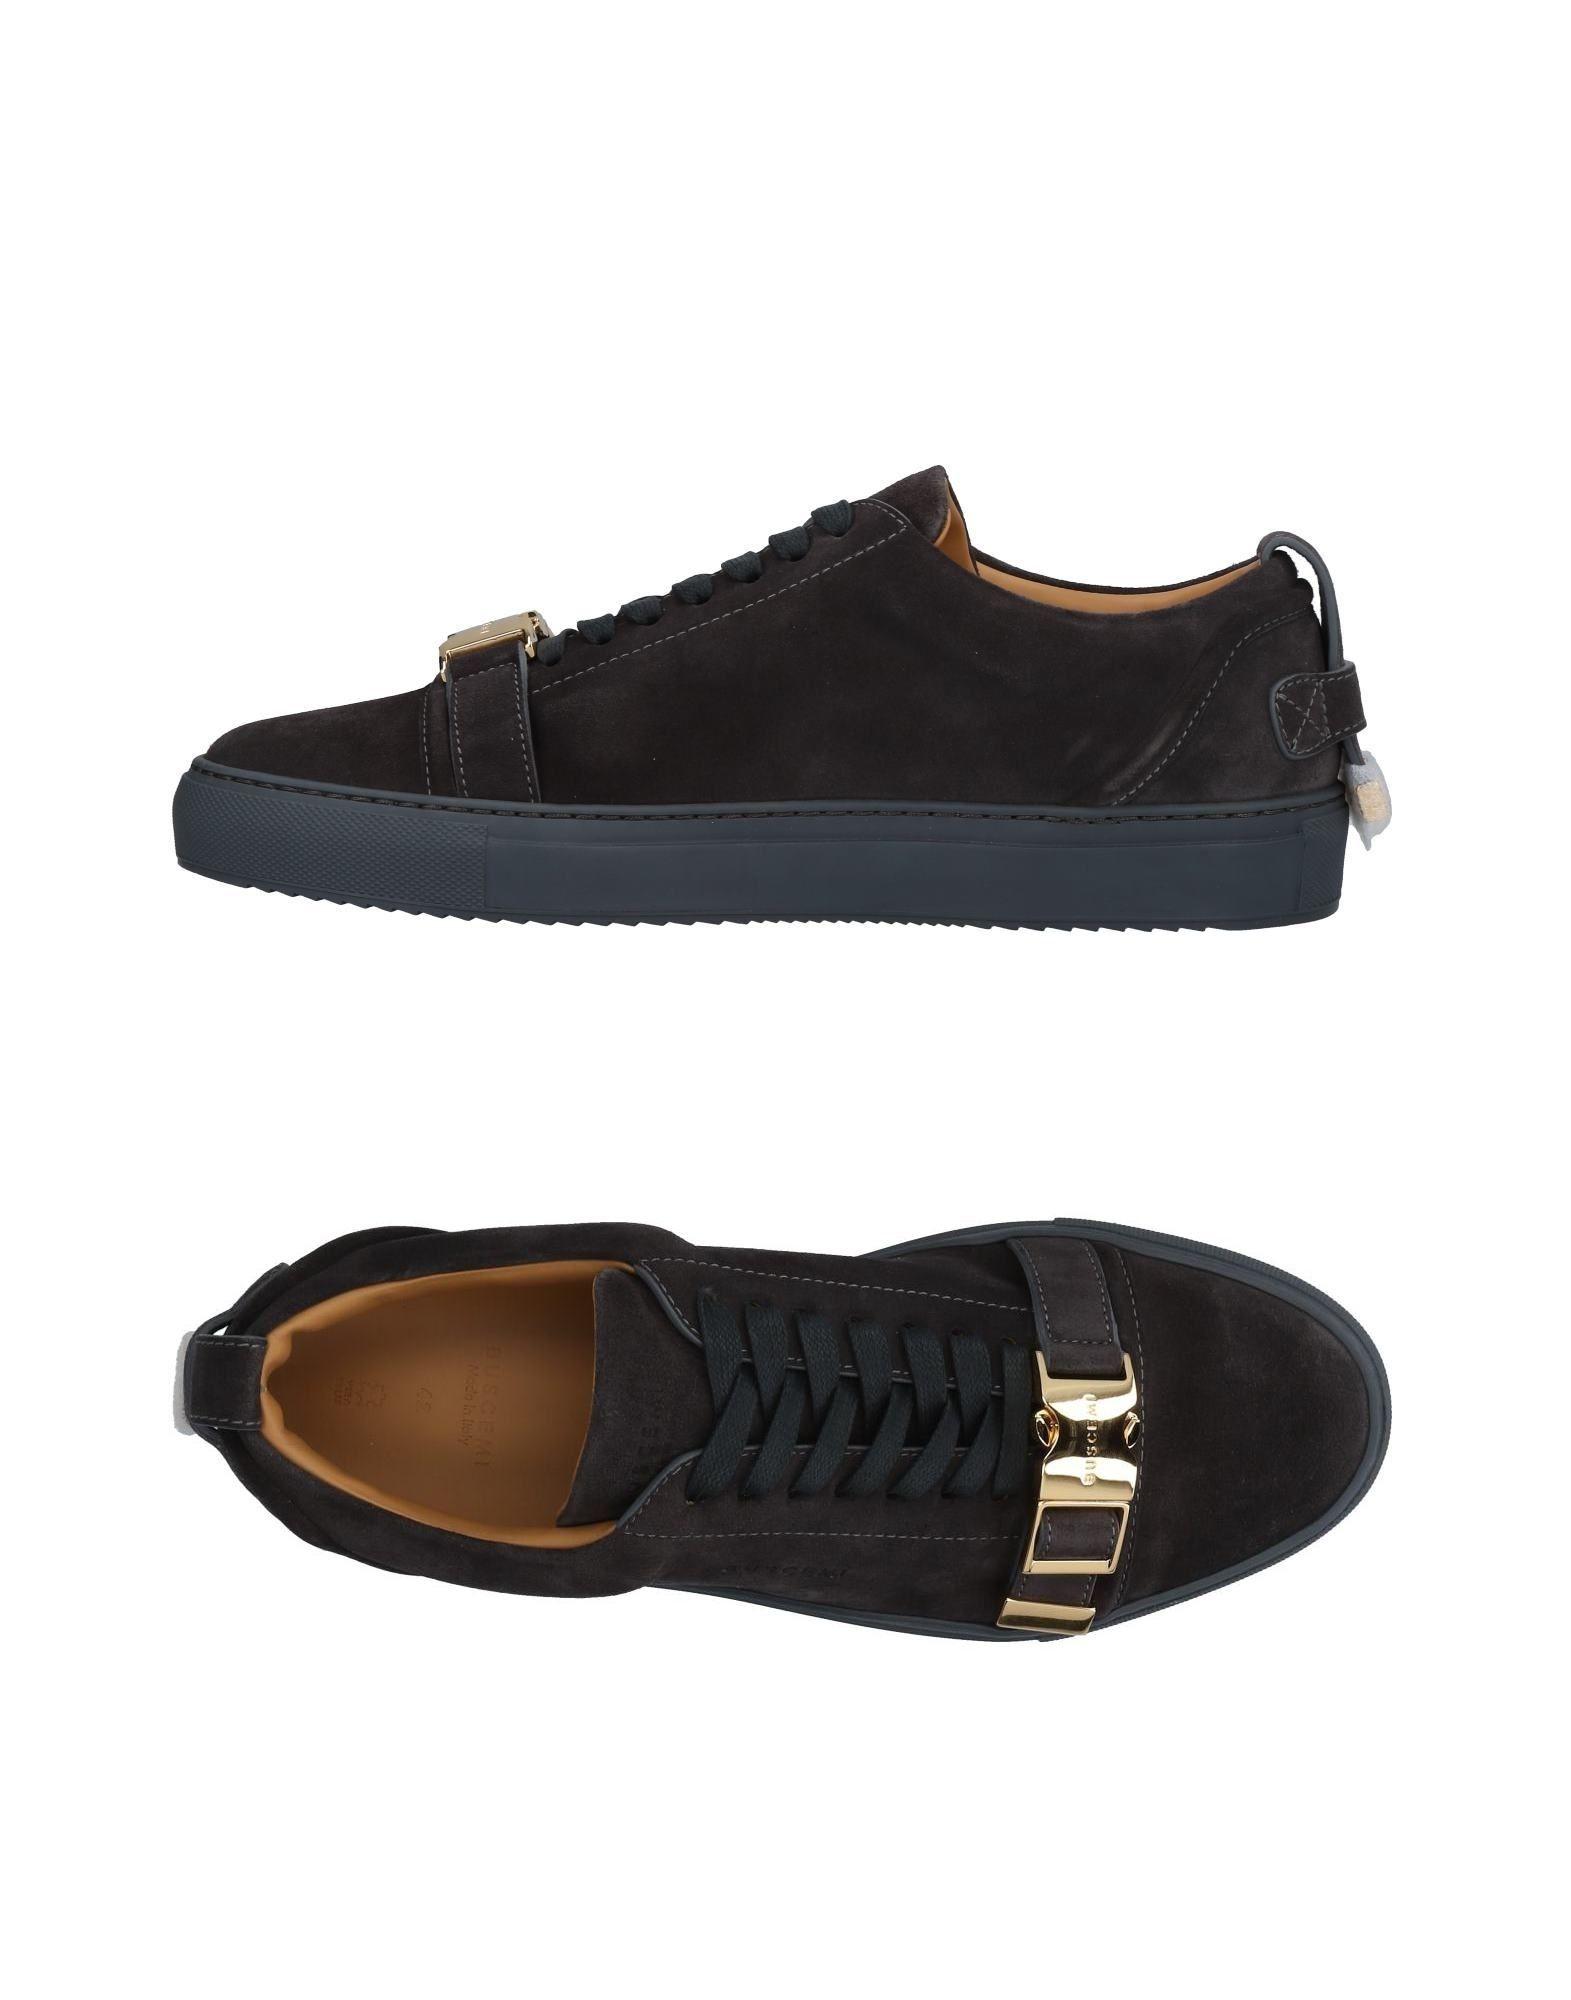 Buscemi Sneakers Gute Herren  11471150WB Gute Sneakers Qualität beliebte Schuhe 5c8ce3